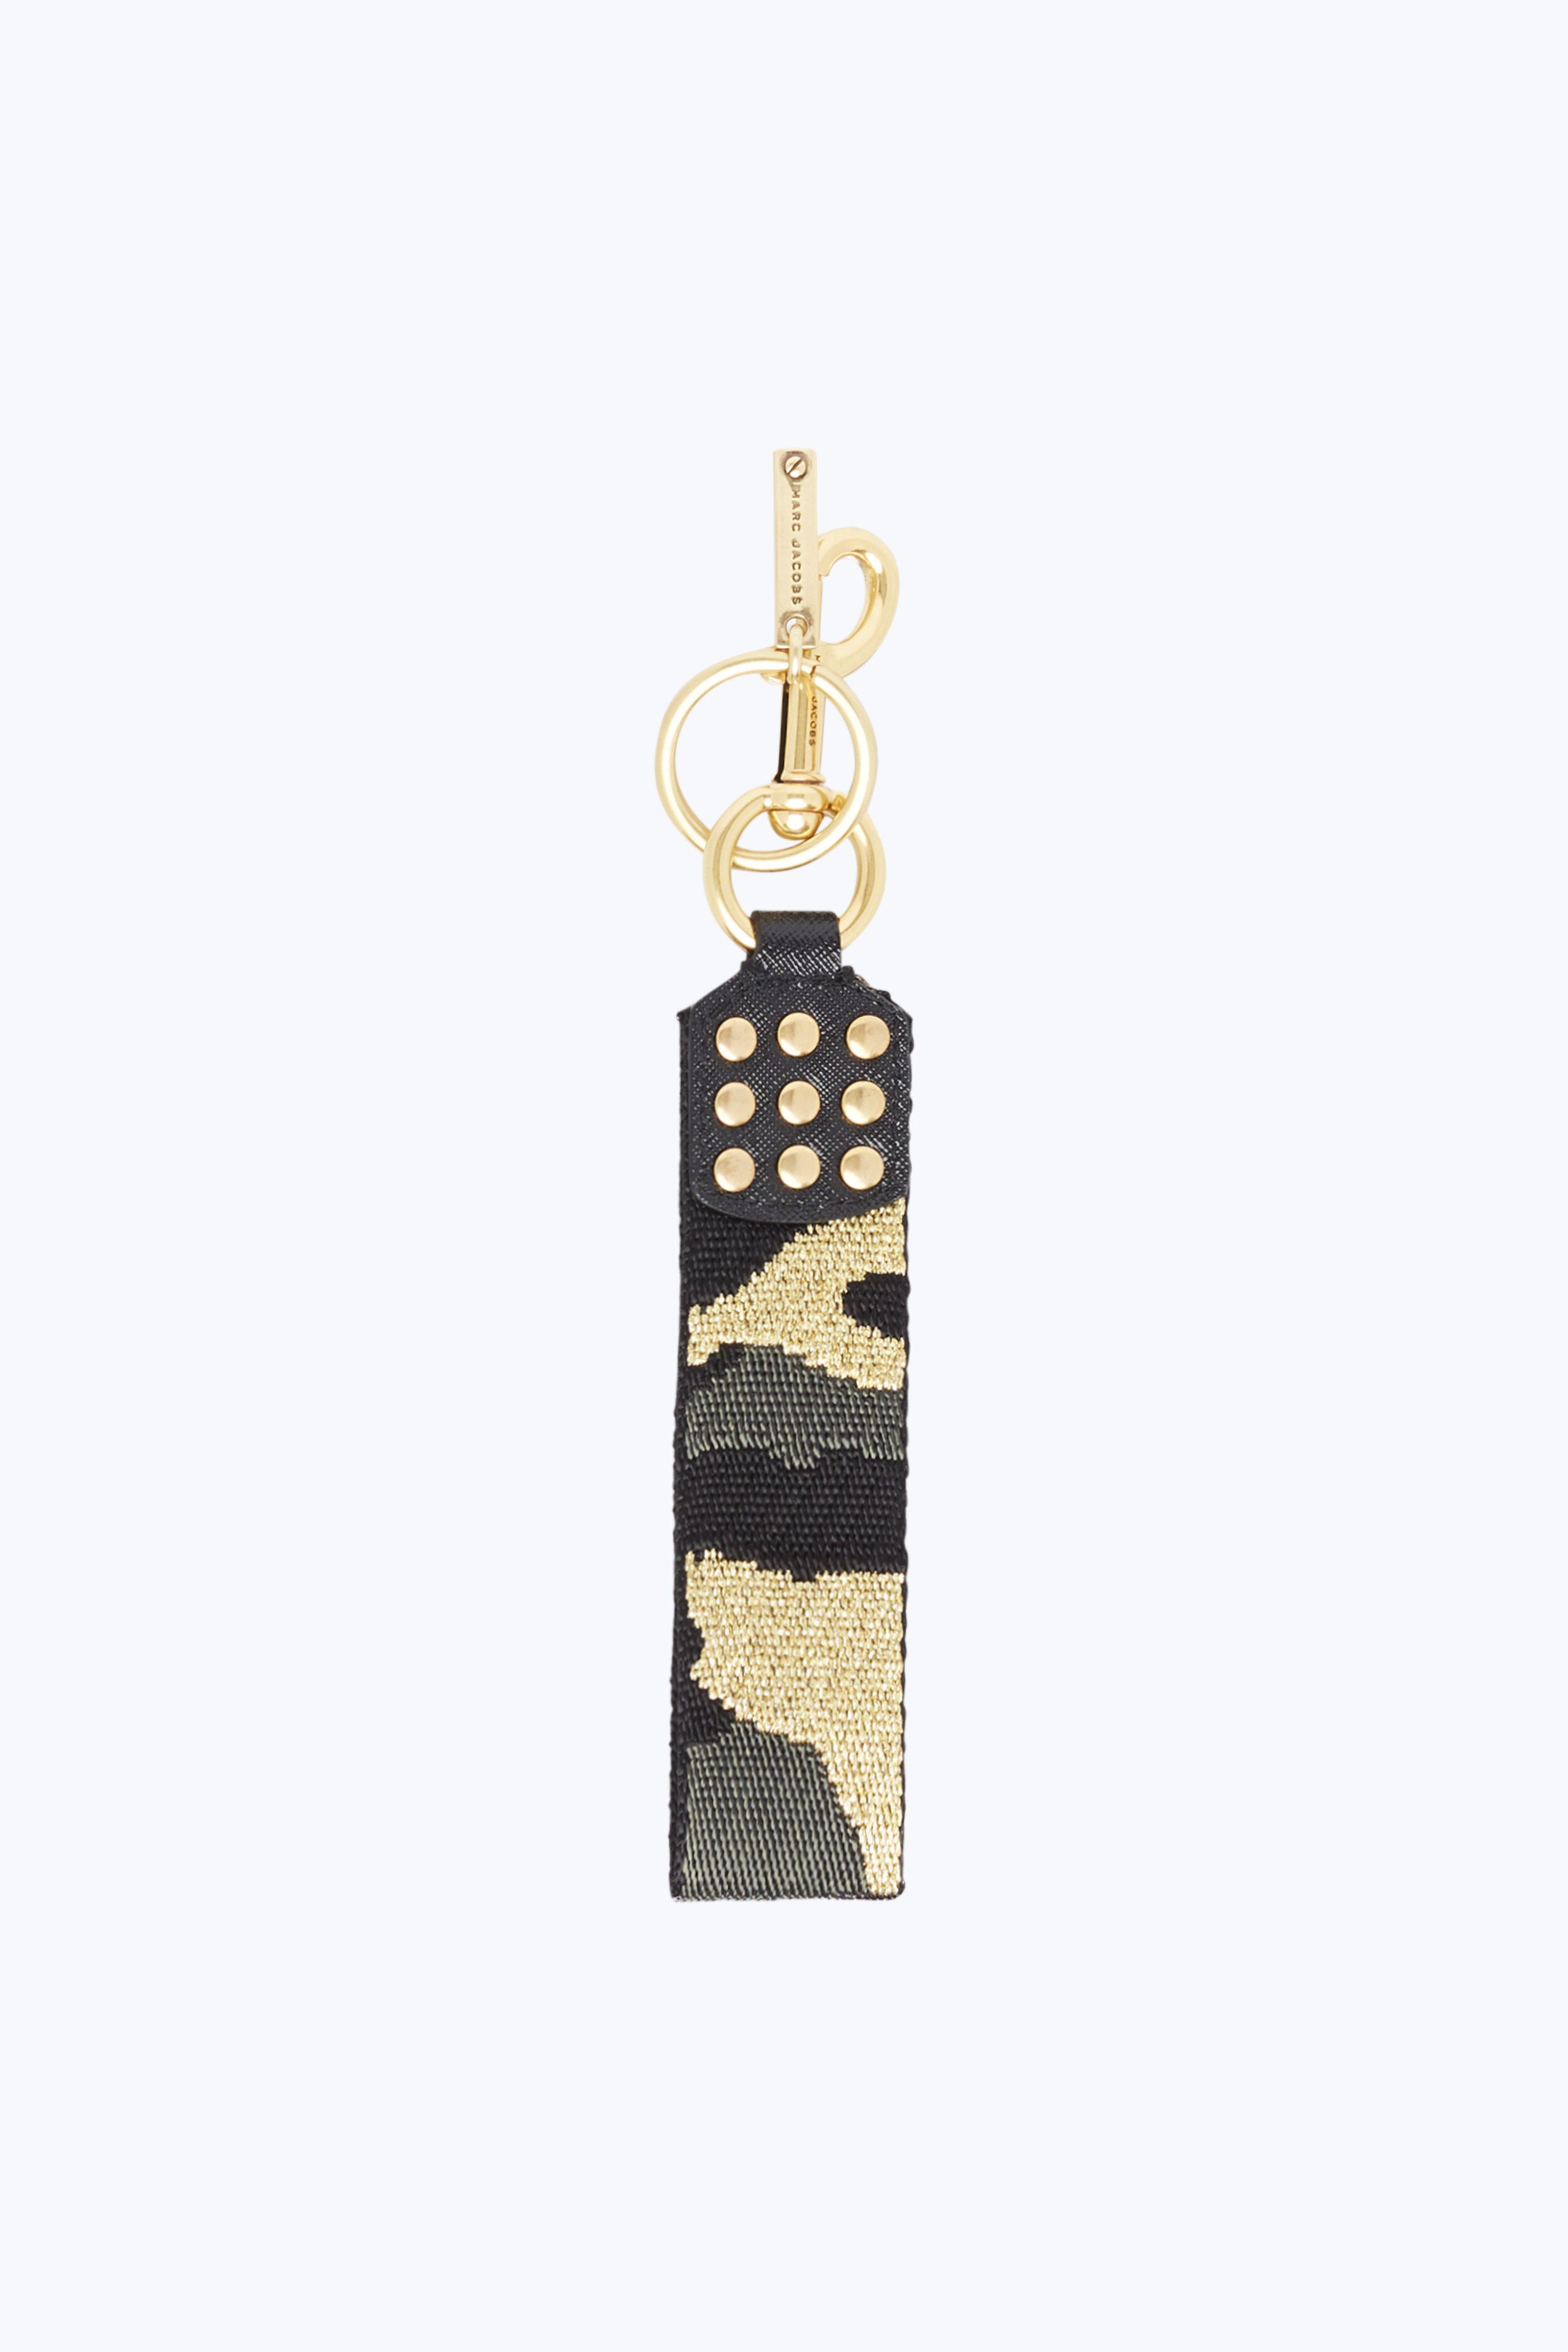 Marc Jacobs Brown Webbing Charm Keychain n0gx4INDPB